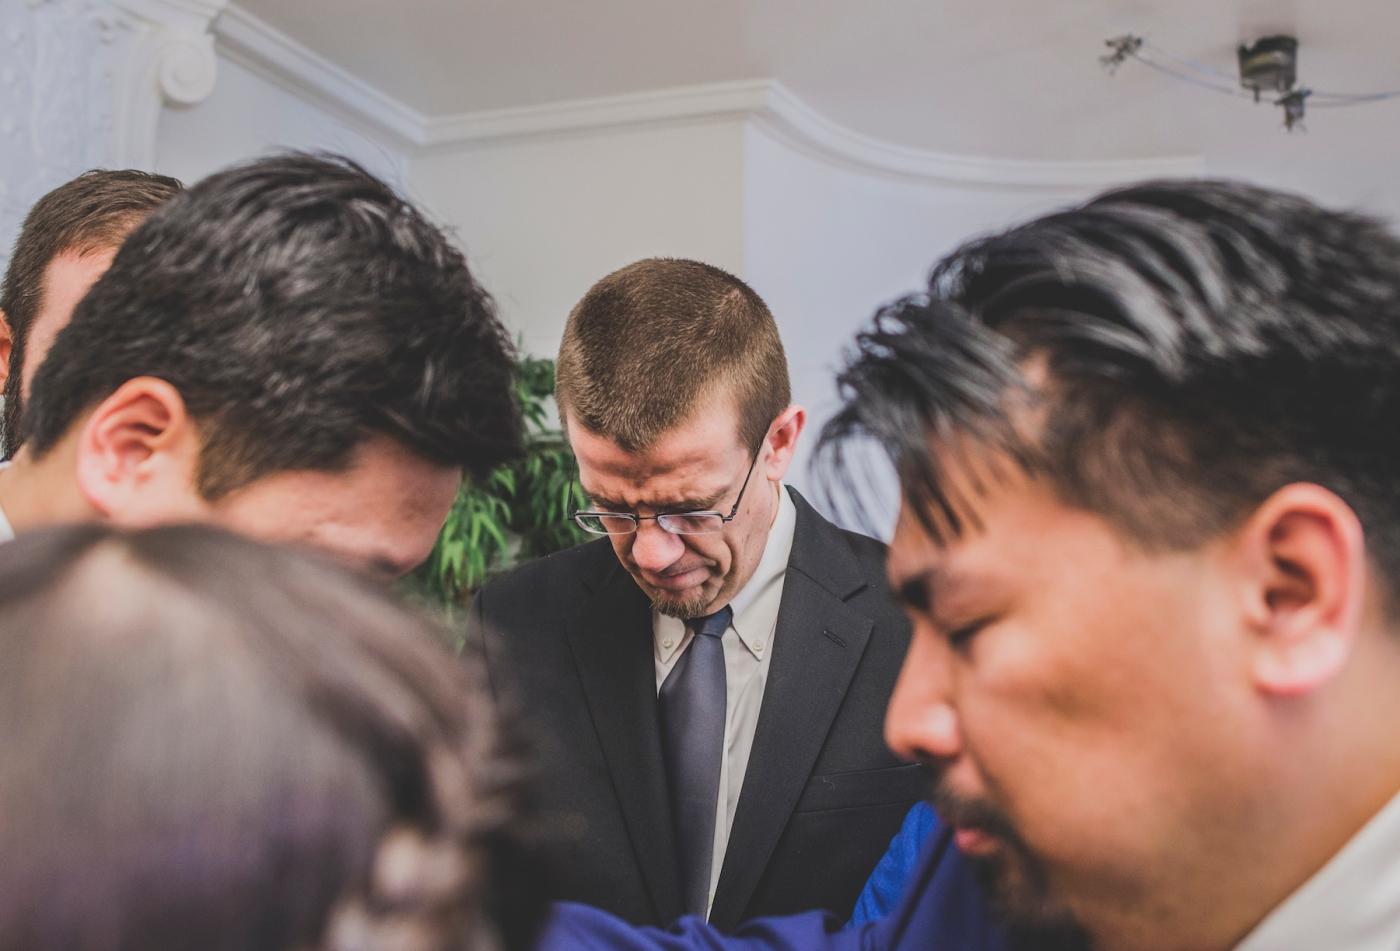 DSC_2395Everett_Wedding_Ballroom_Jane_Speleers_photography_Rachel_and_Edmund_Praying_2017